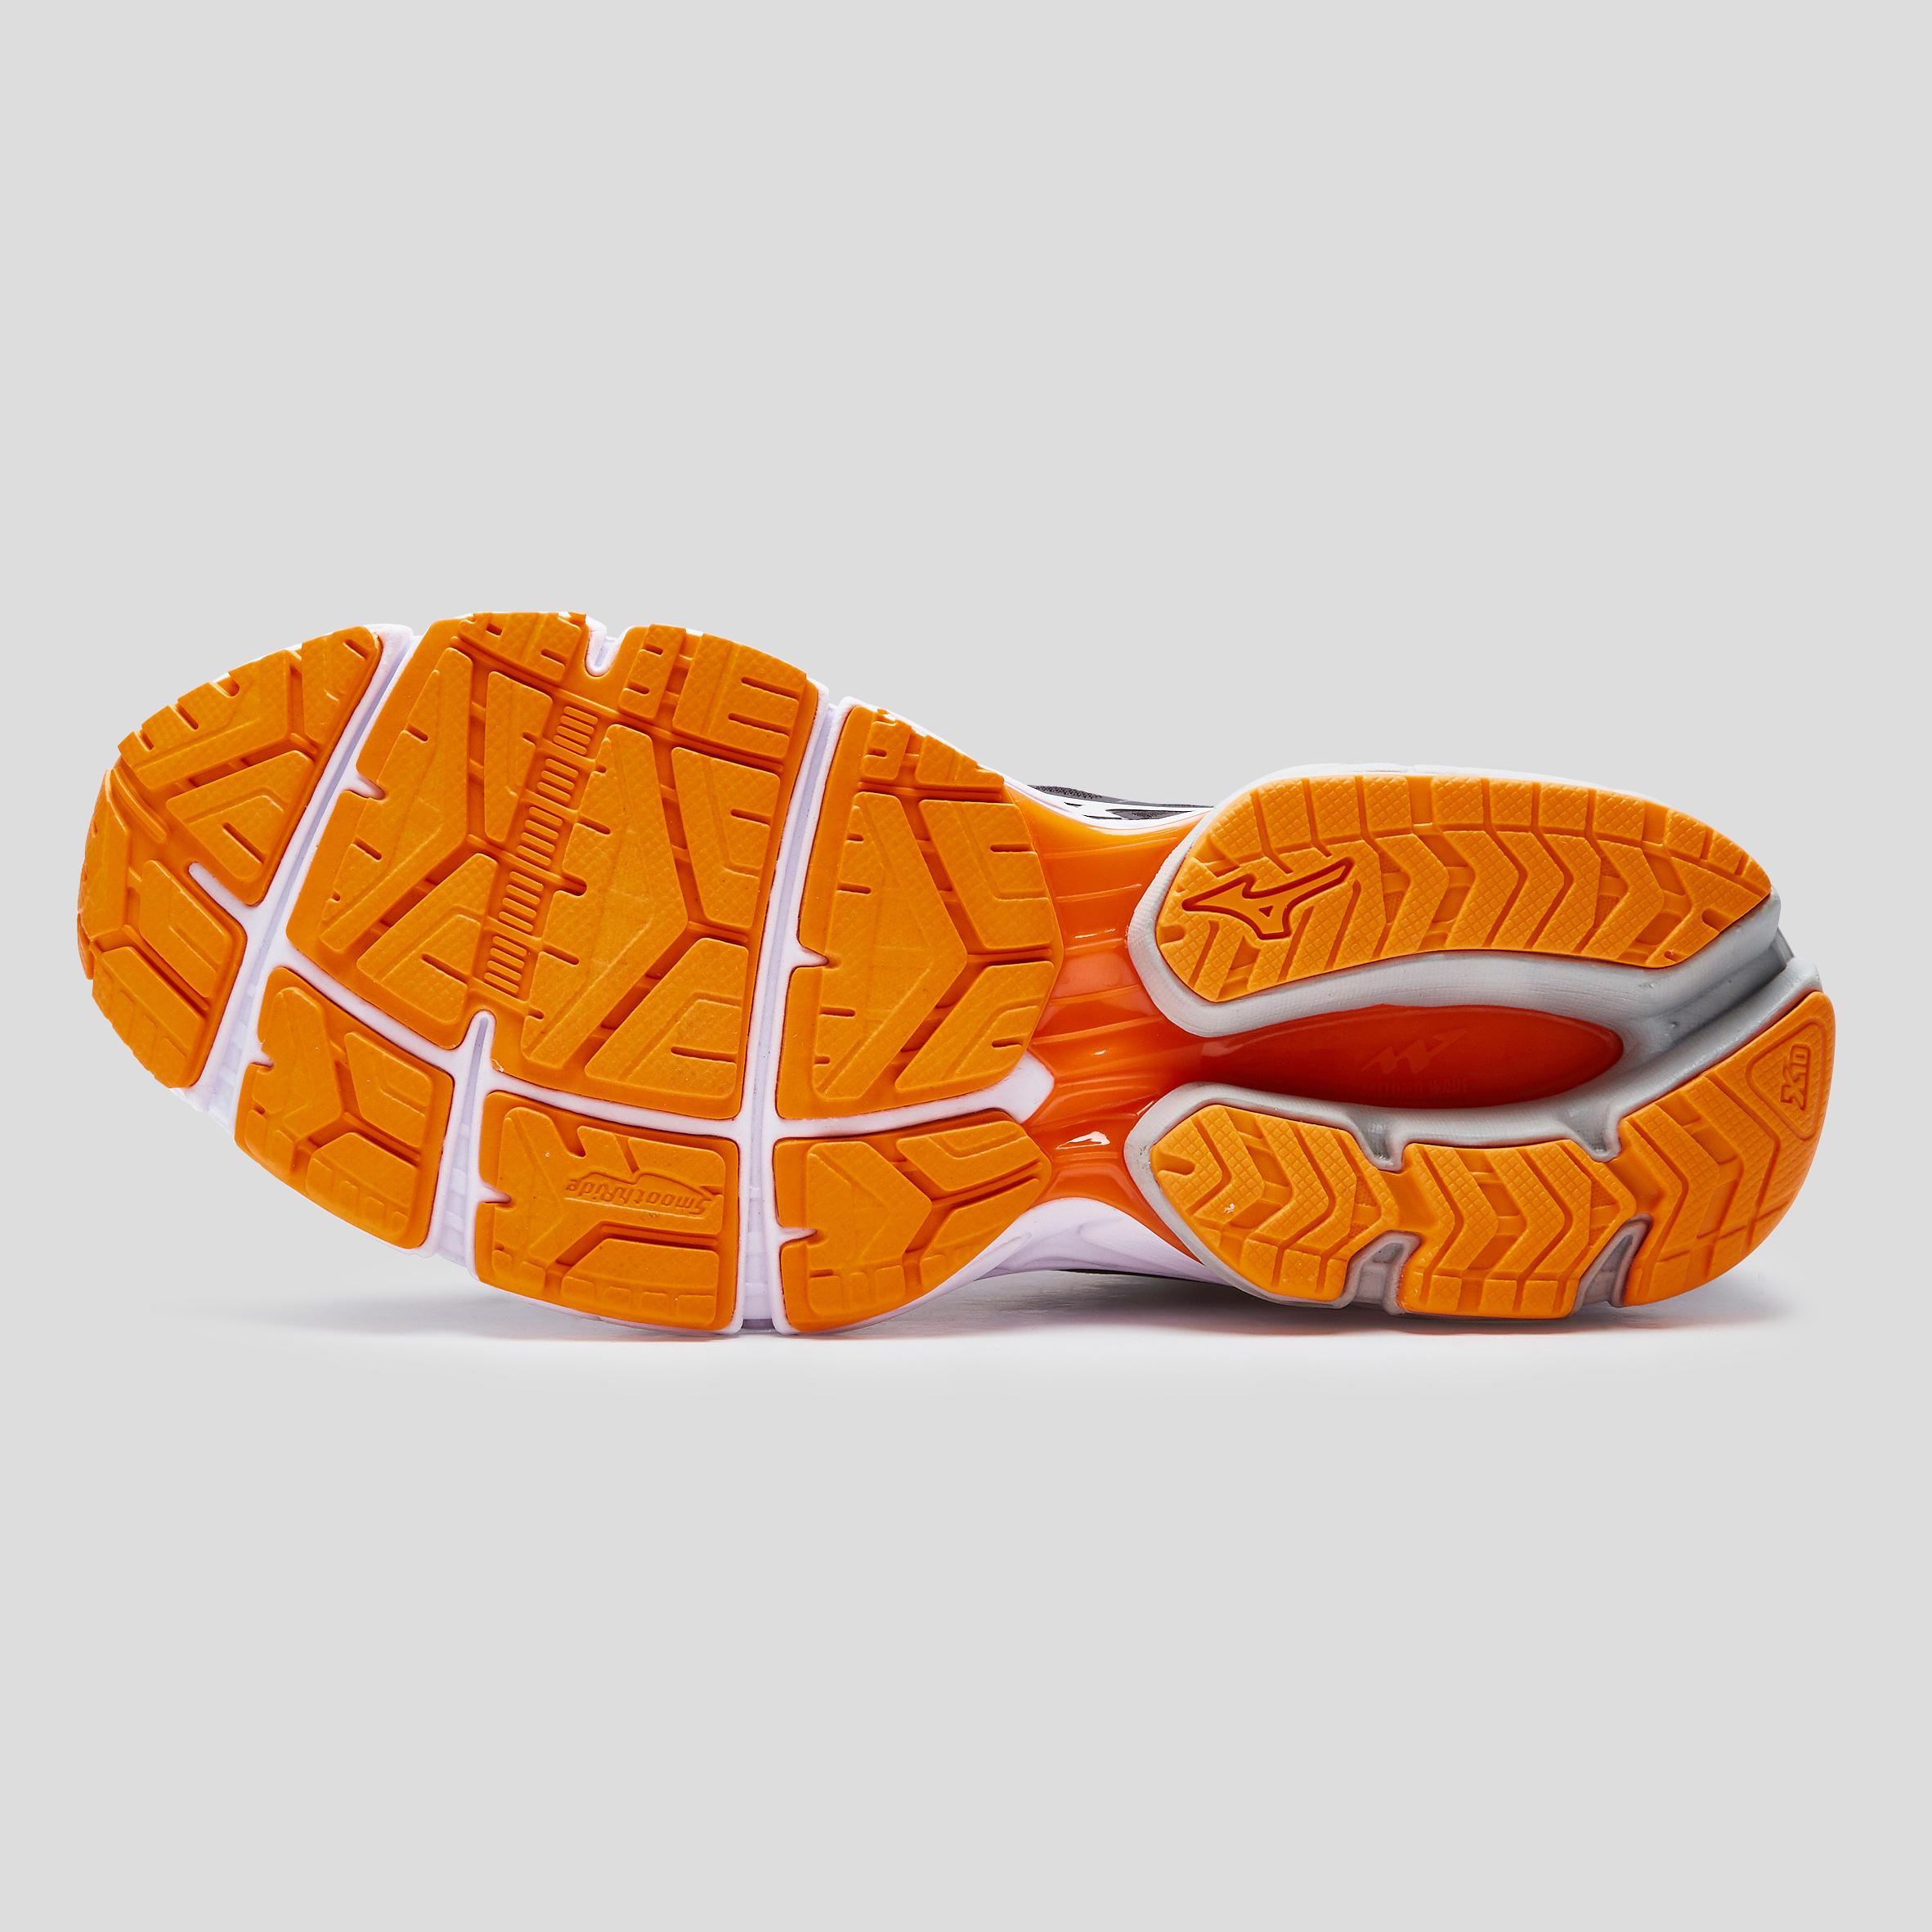 mens mizuno running shoes size 9.5 eu weight only canada 2018